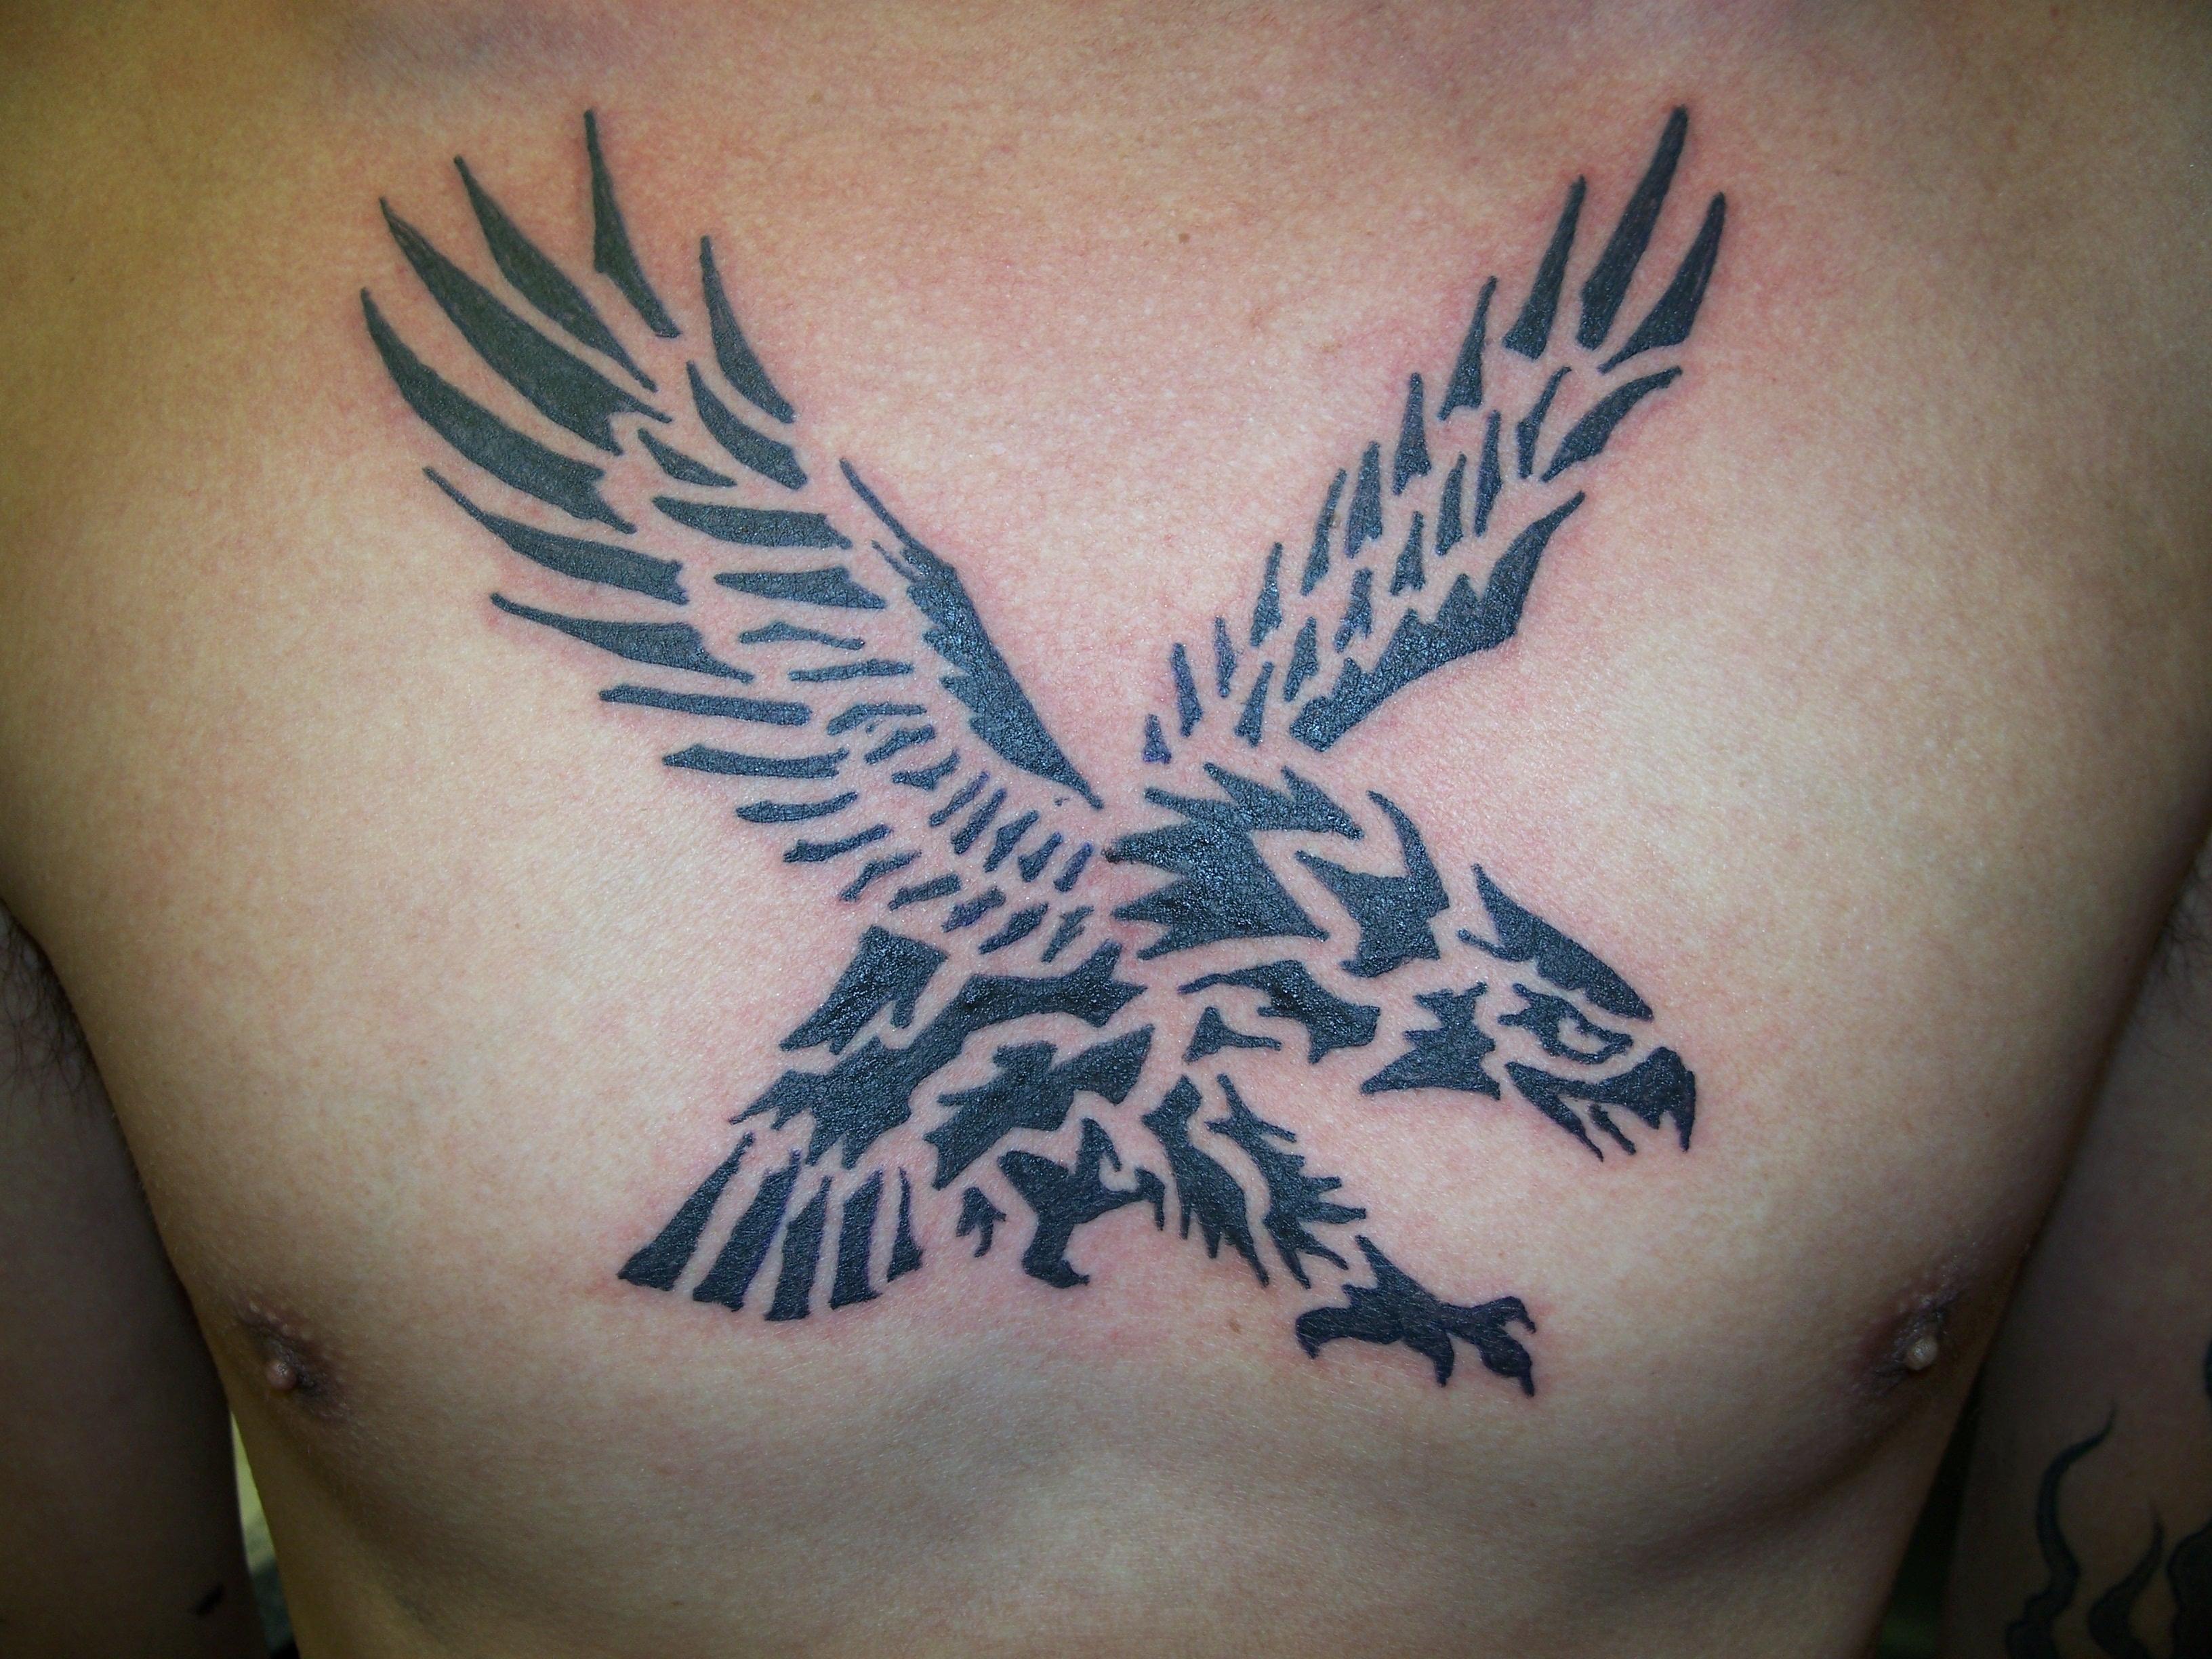 https://i0.wp.com/upload.wikimedia.org/wikipedia/commons/0/06/Tribal_eagle_tattoo_by_Keith_Killingsworth.JPG